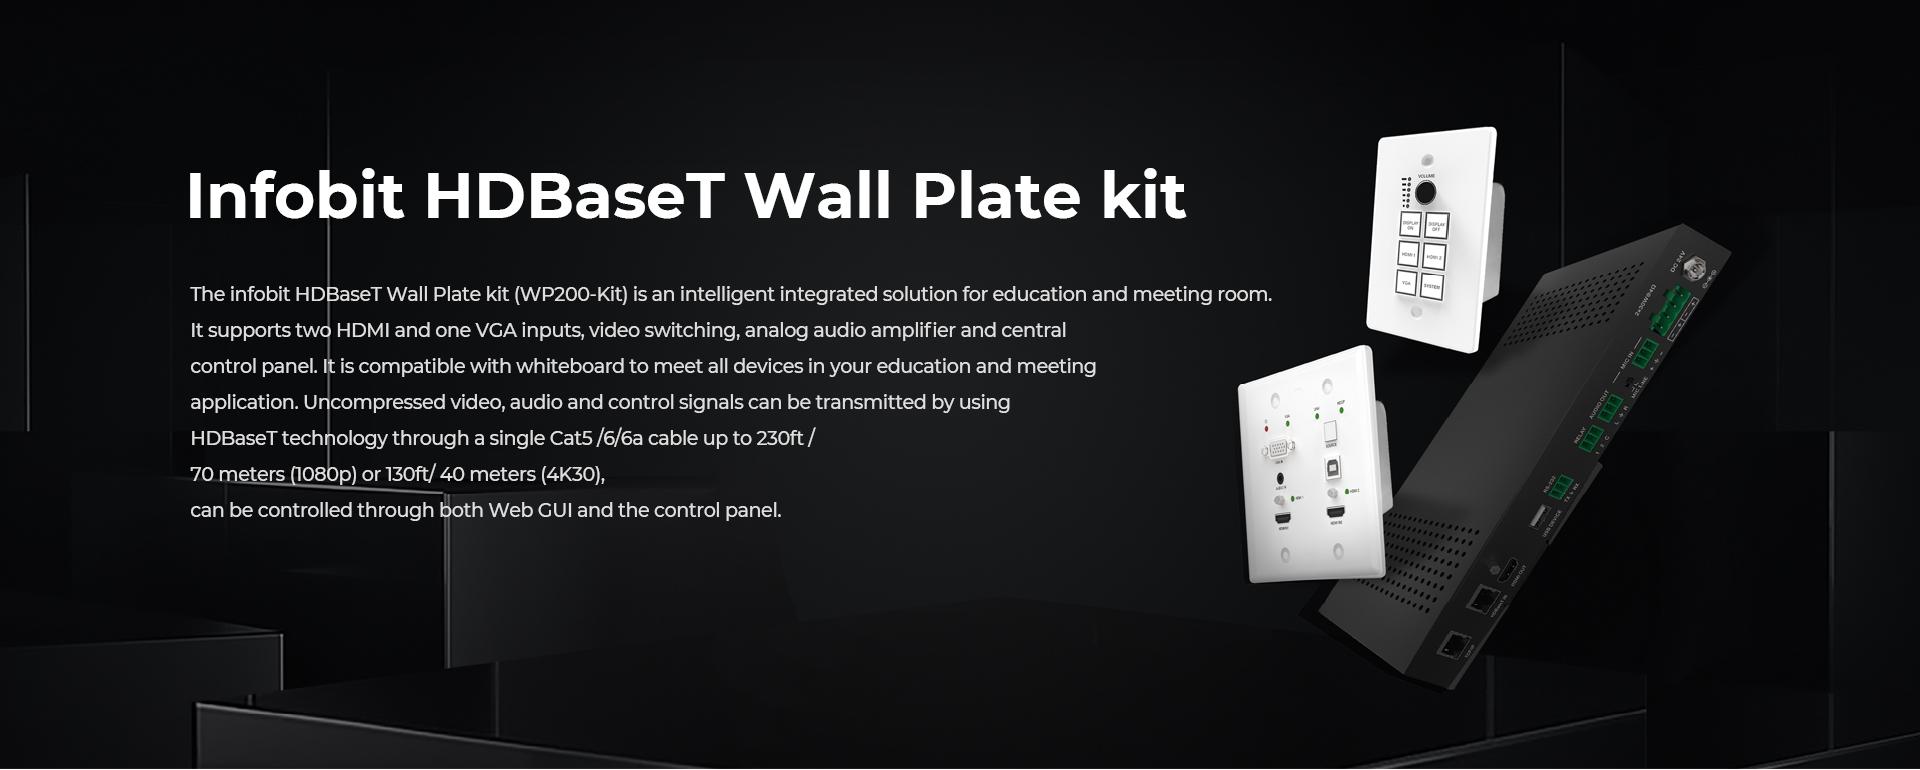 iTrans WP200 Kit HDBaseT Wall Plate transmitter receiver